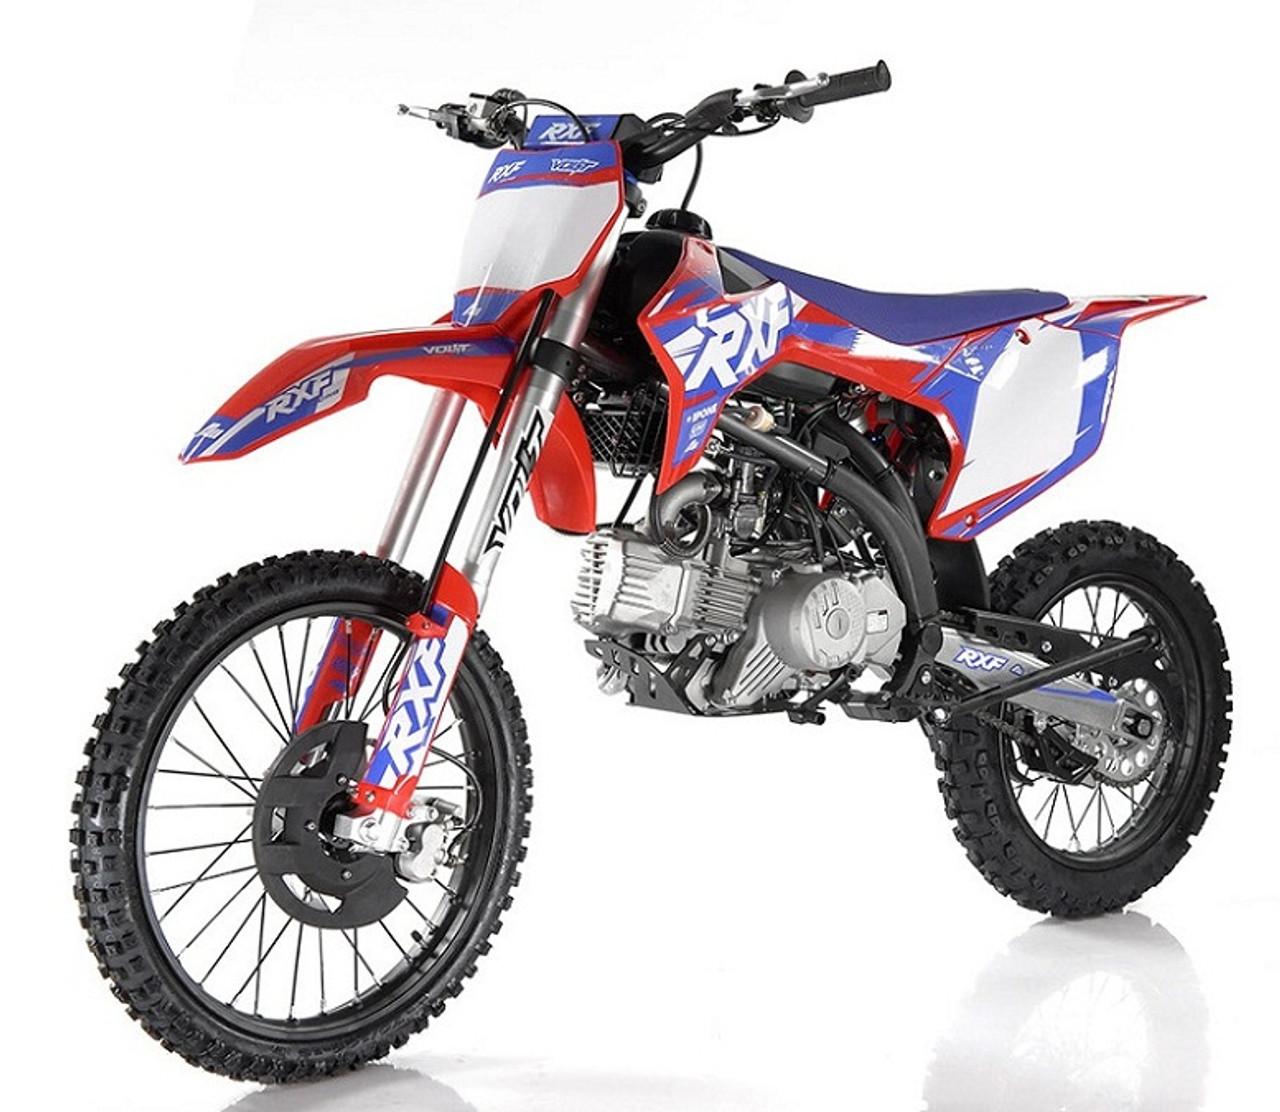 Apollo RXF 200 Freeride Max Manual Dirt Bike, Electric/Kicker Start